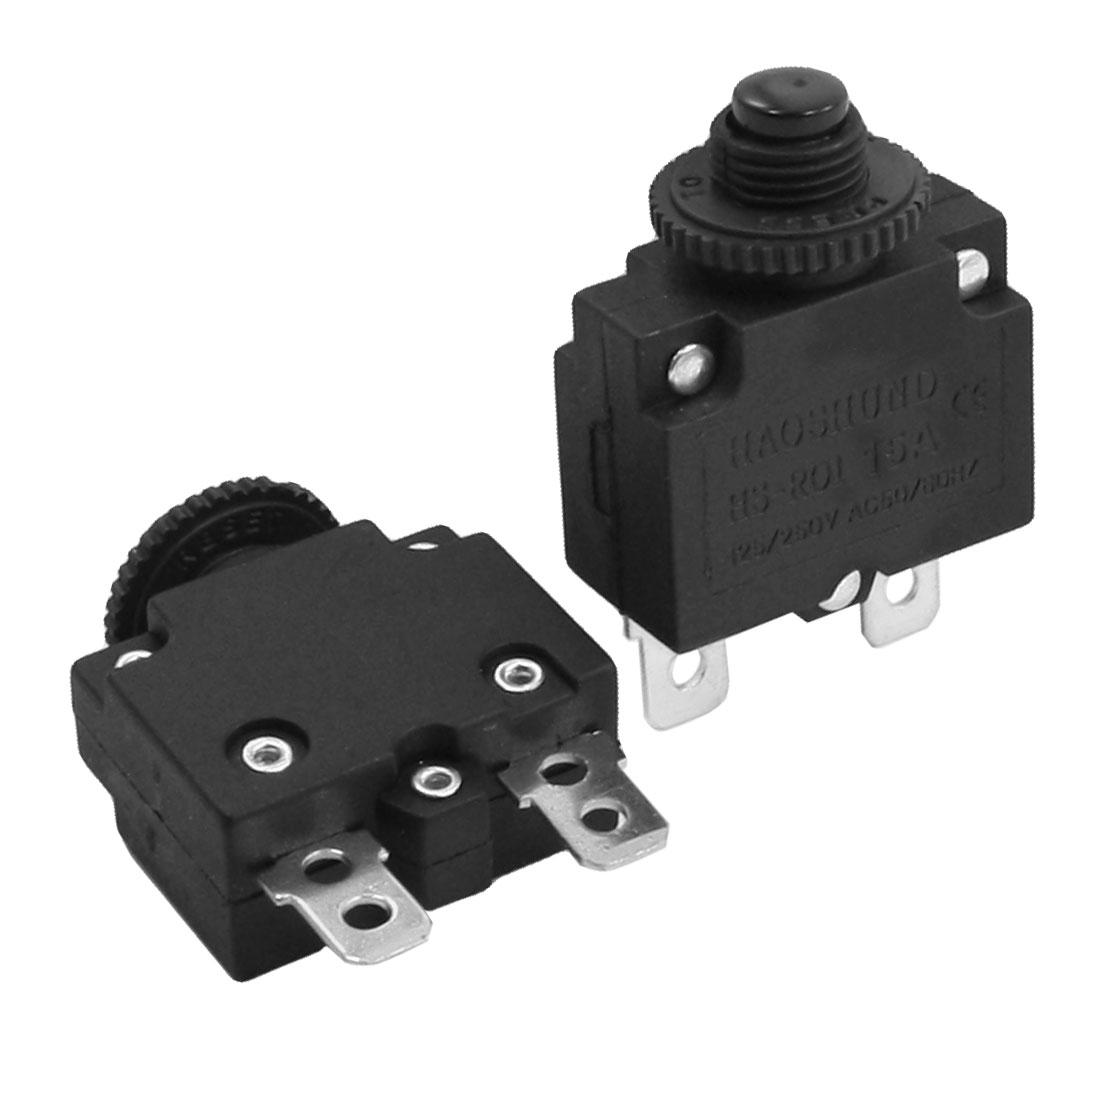 2Pcs Reset Thermal Overload Protector Circuit Breaker AC 125V 250V 15A